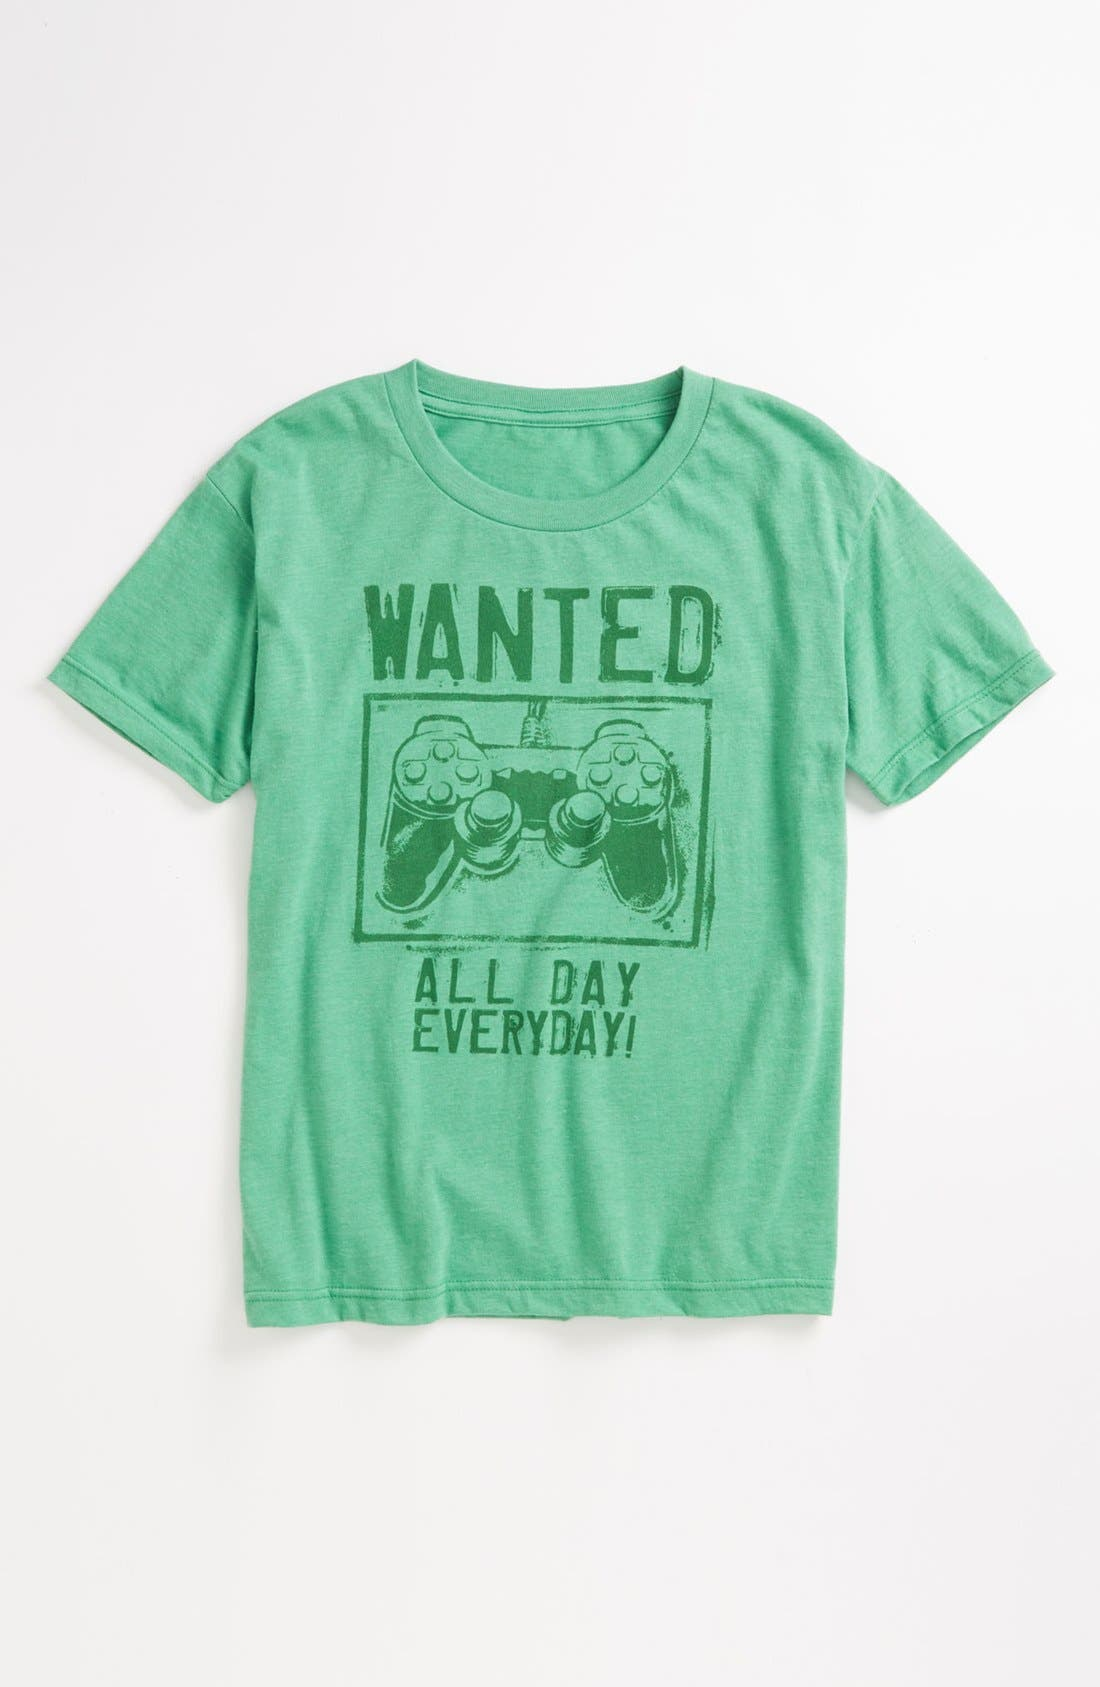 Alternate Image 1 Selected - Jem 'Wanted' Screenprint T-Shirt (Big Boys)